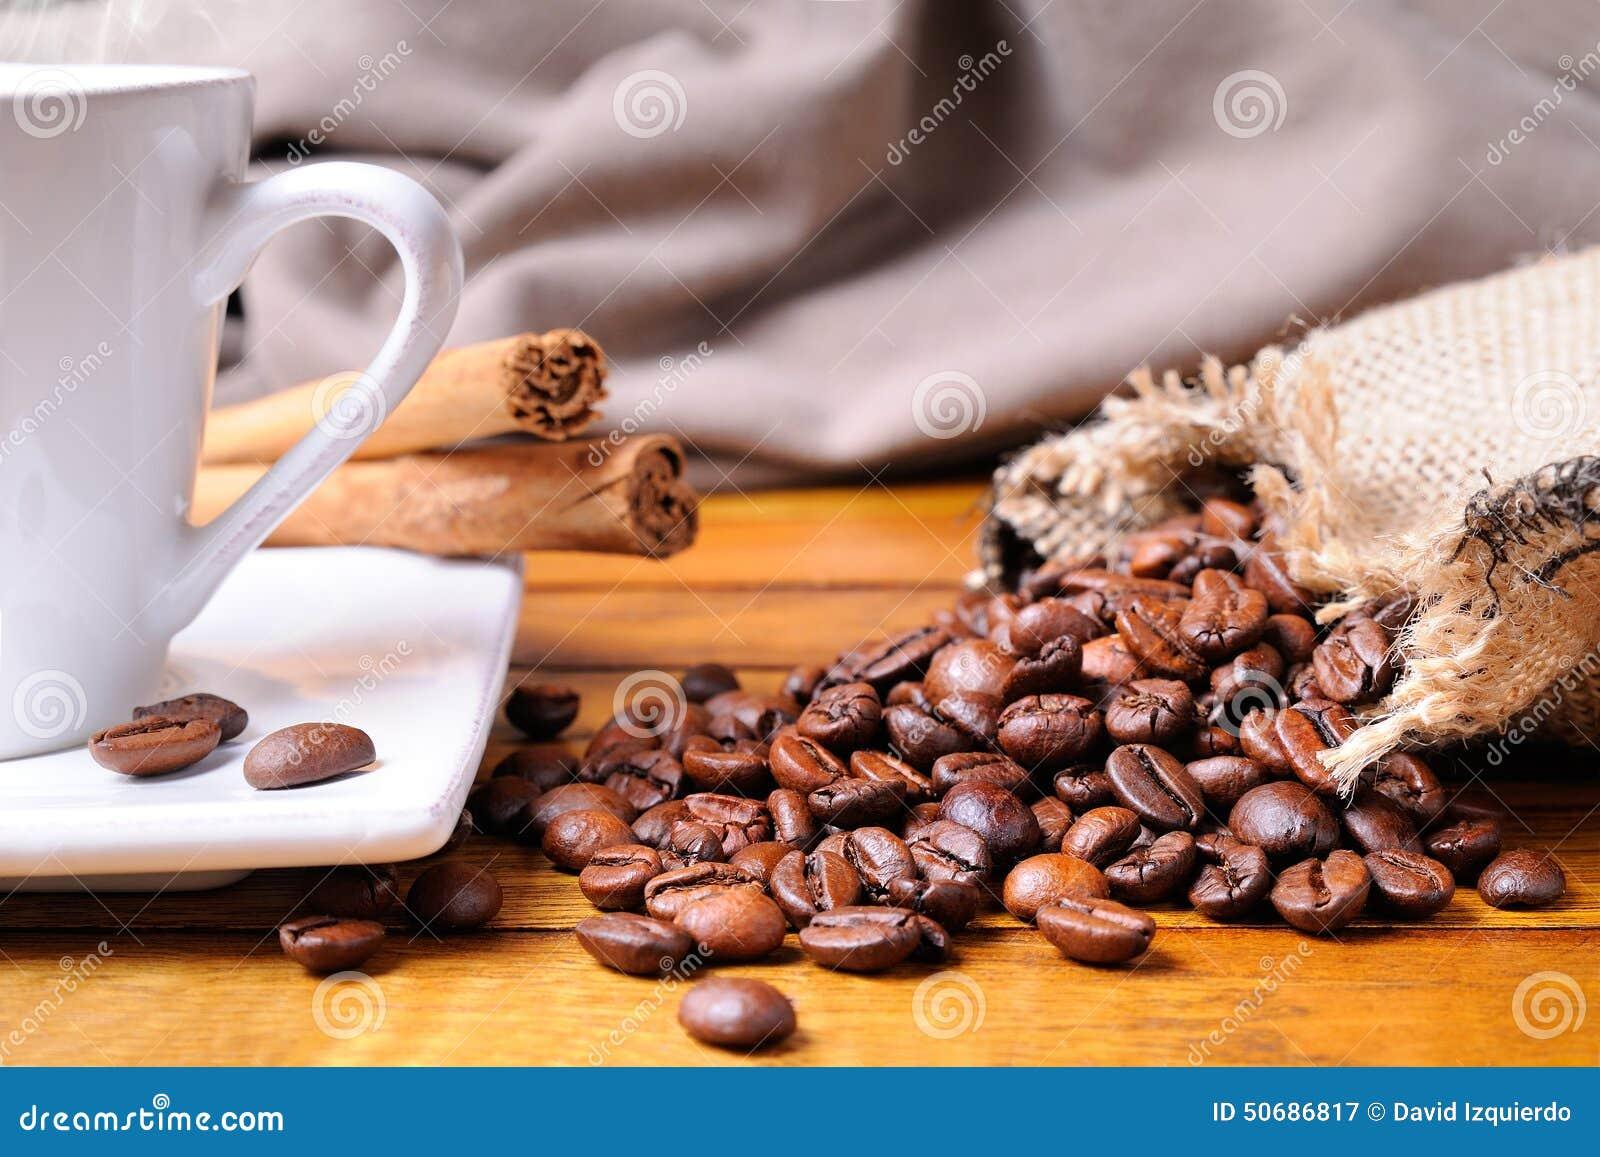 Download 咖啡在一张棕色木桌正面图的 库存图片. 图片 包括有 茶碟, 蒸汽, 泡沫, 制动手, browne, 鲜美 - 50686817